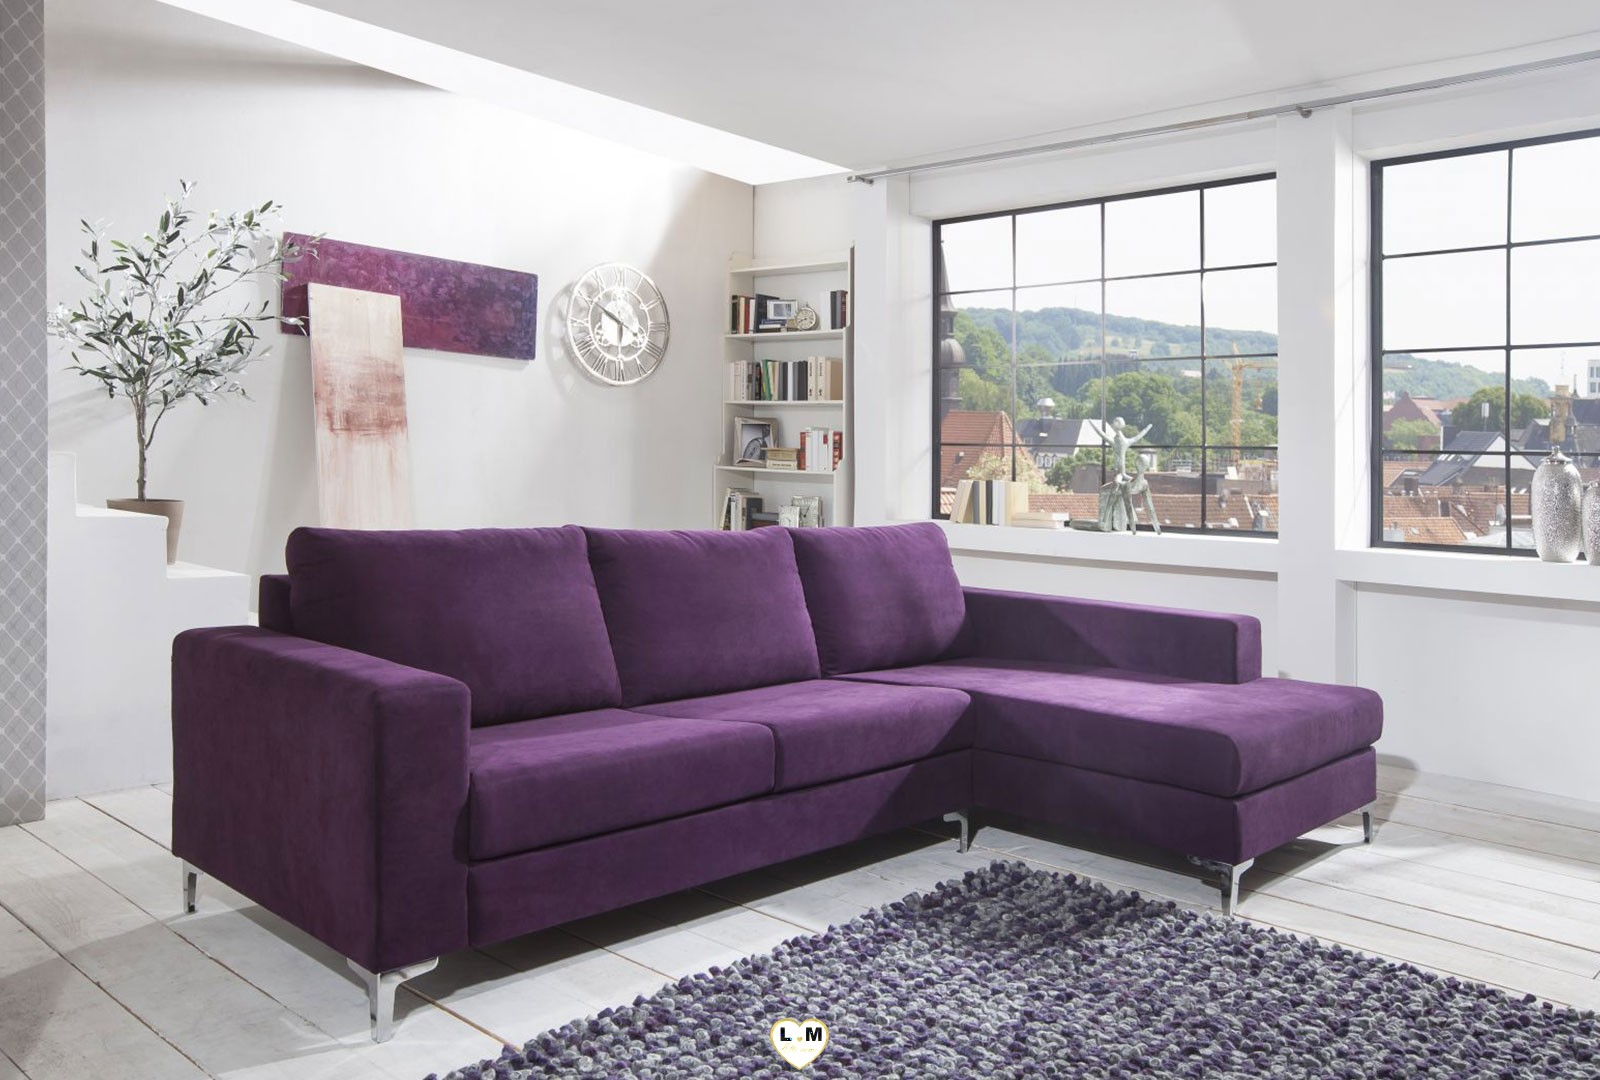 Prya violet canape angle tissus lignemeuble com - Canape convertible violet ...